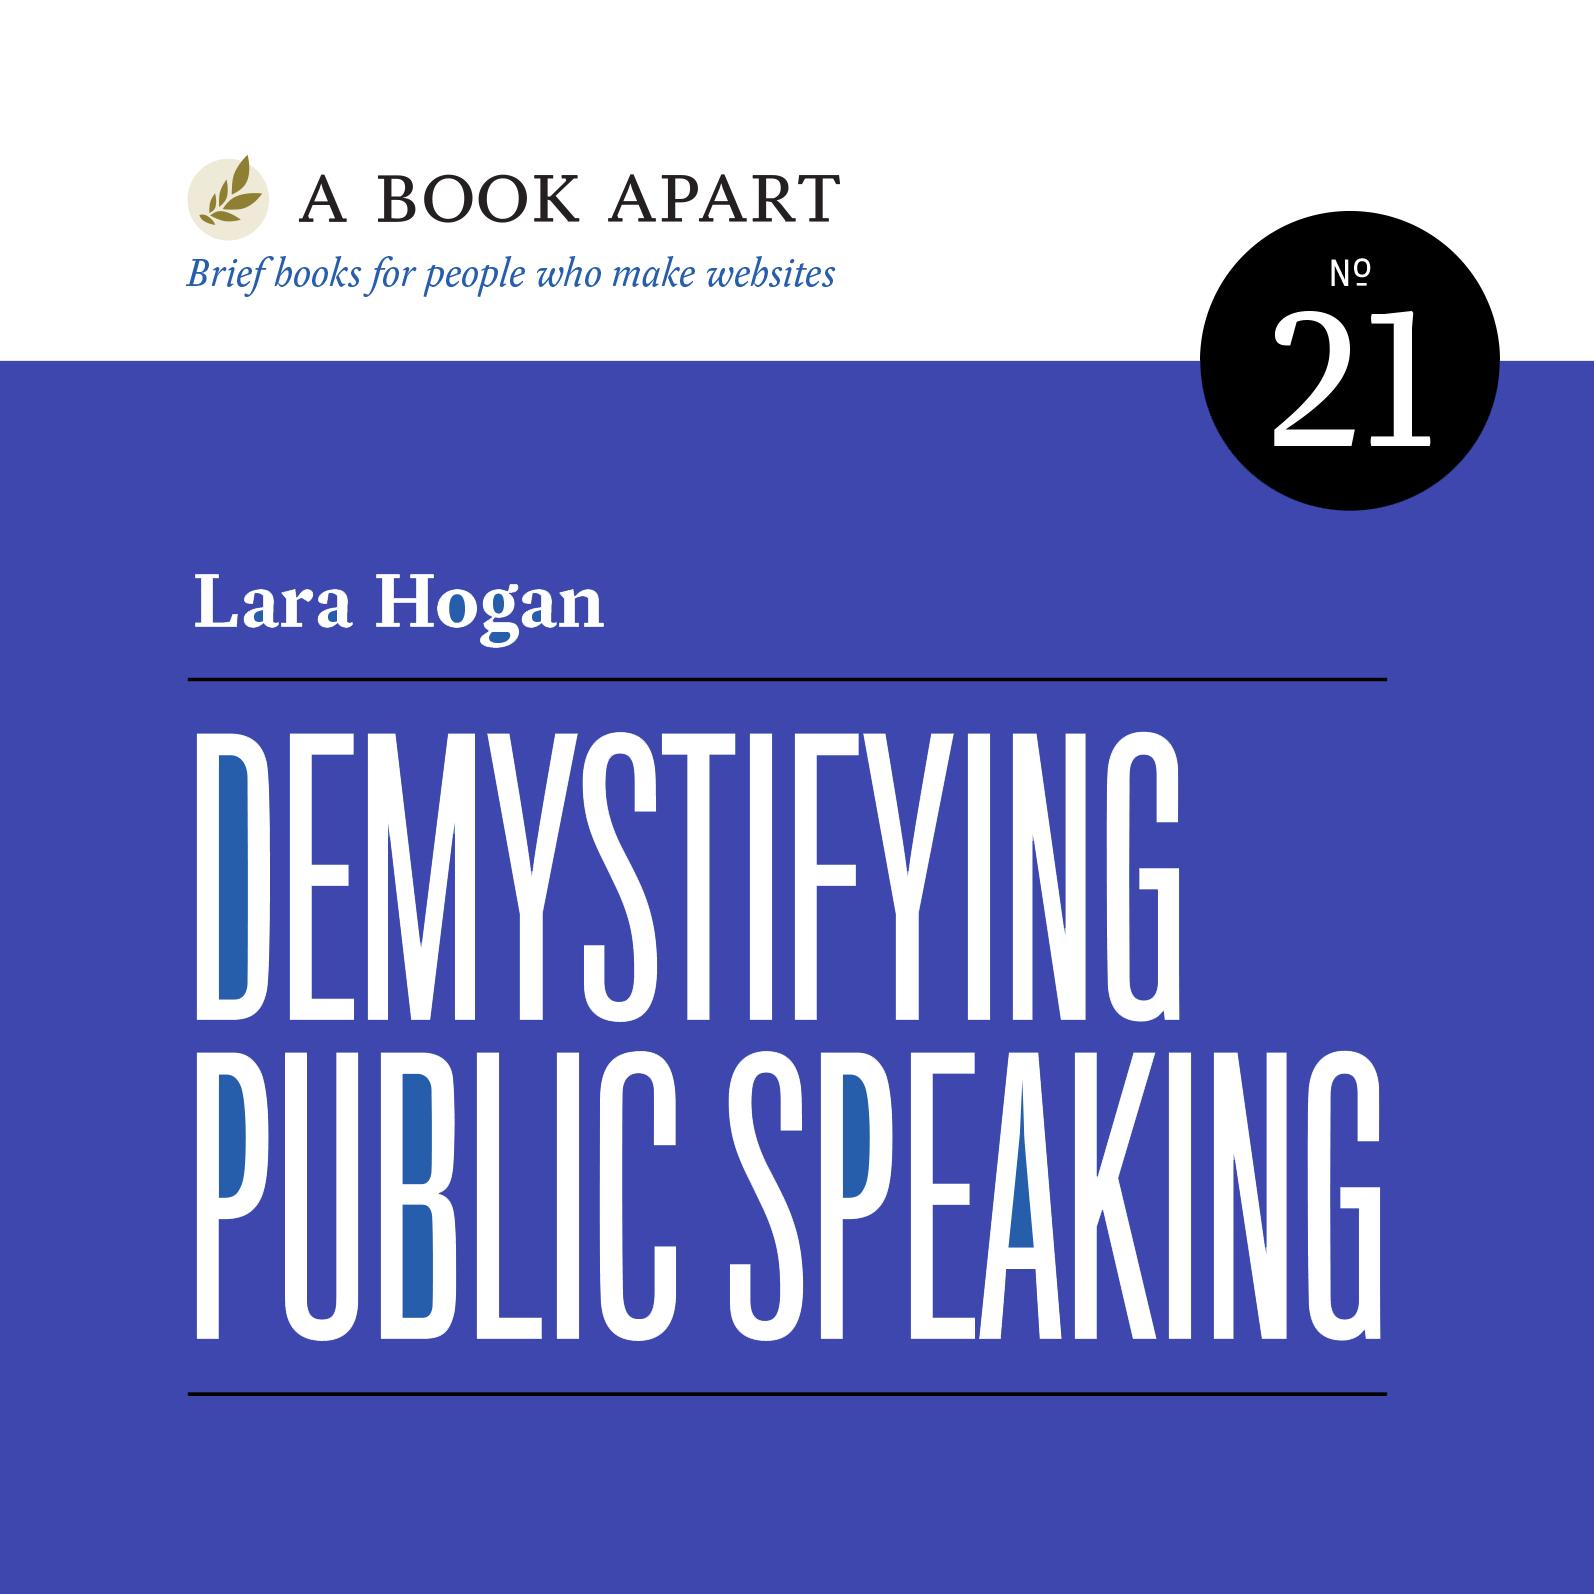 Demystifying Public Speaking by Lara Callender Hogan